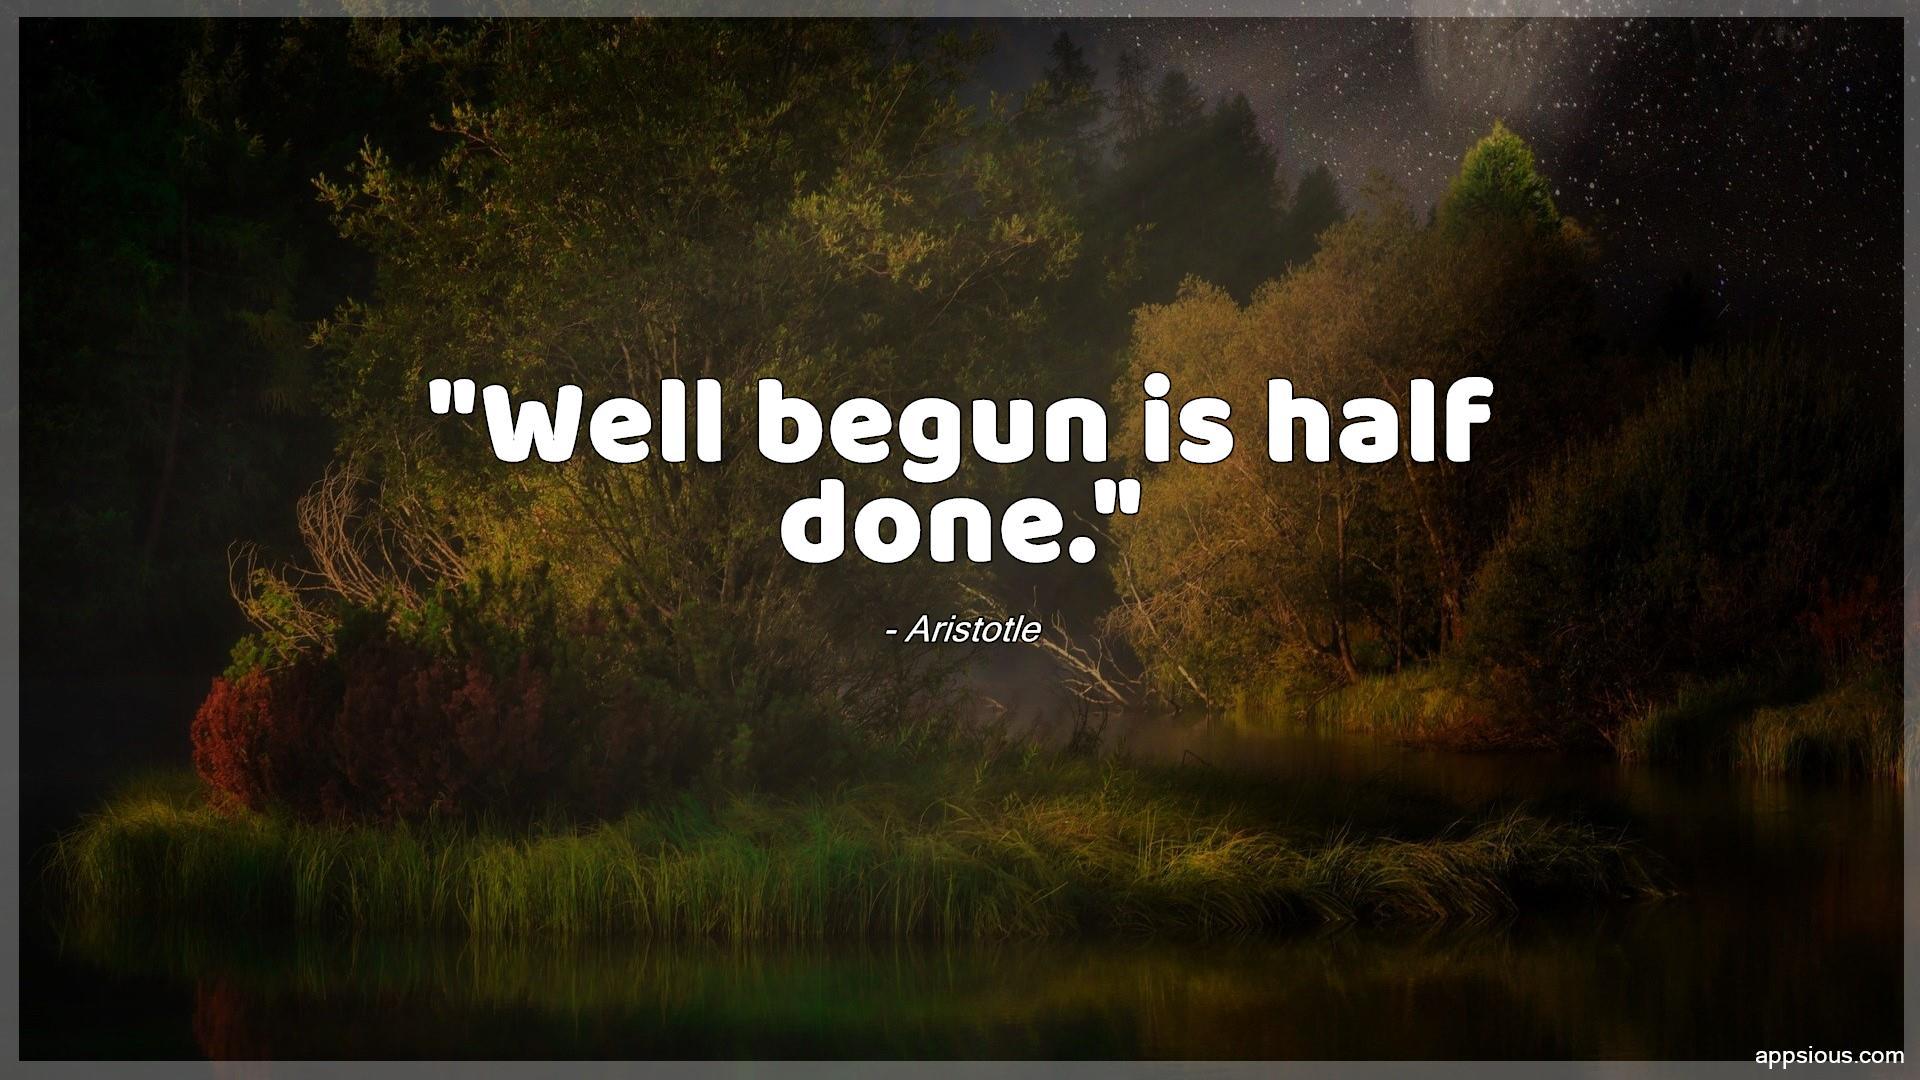 Well begun is half done.